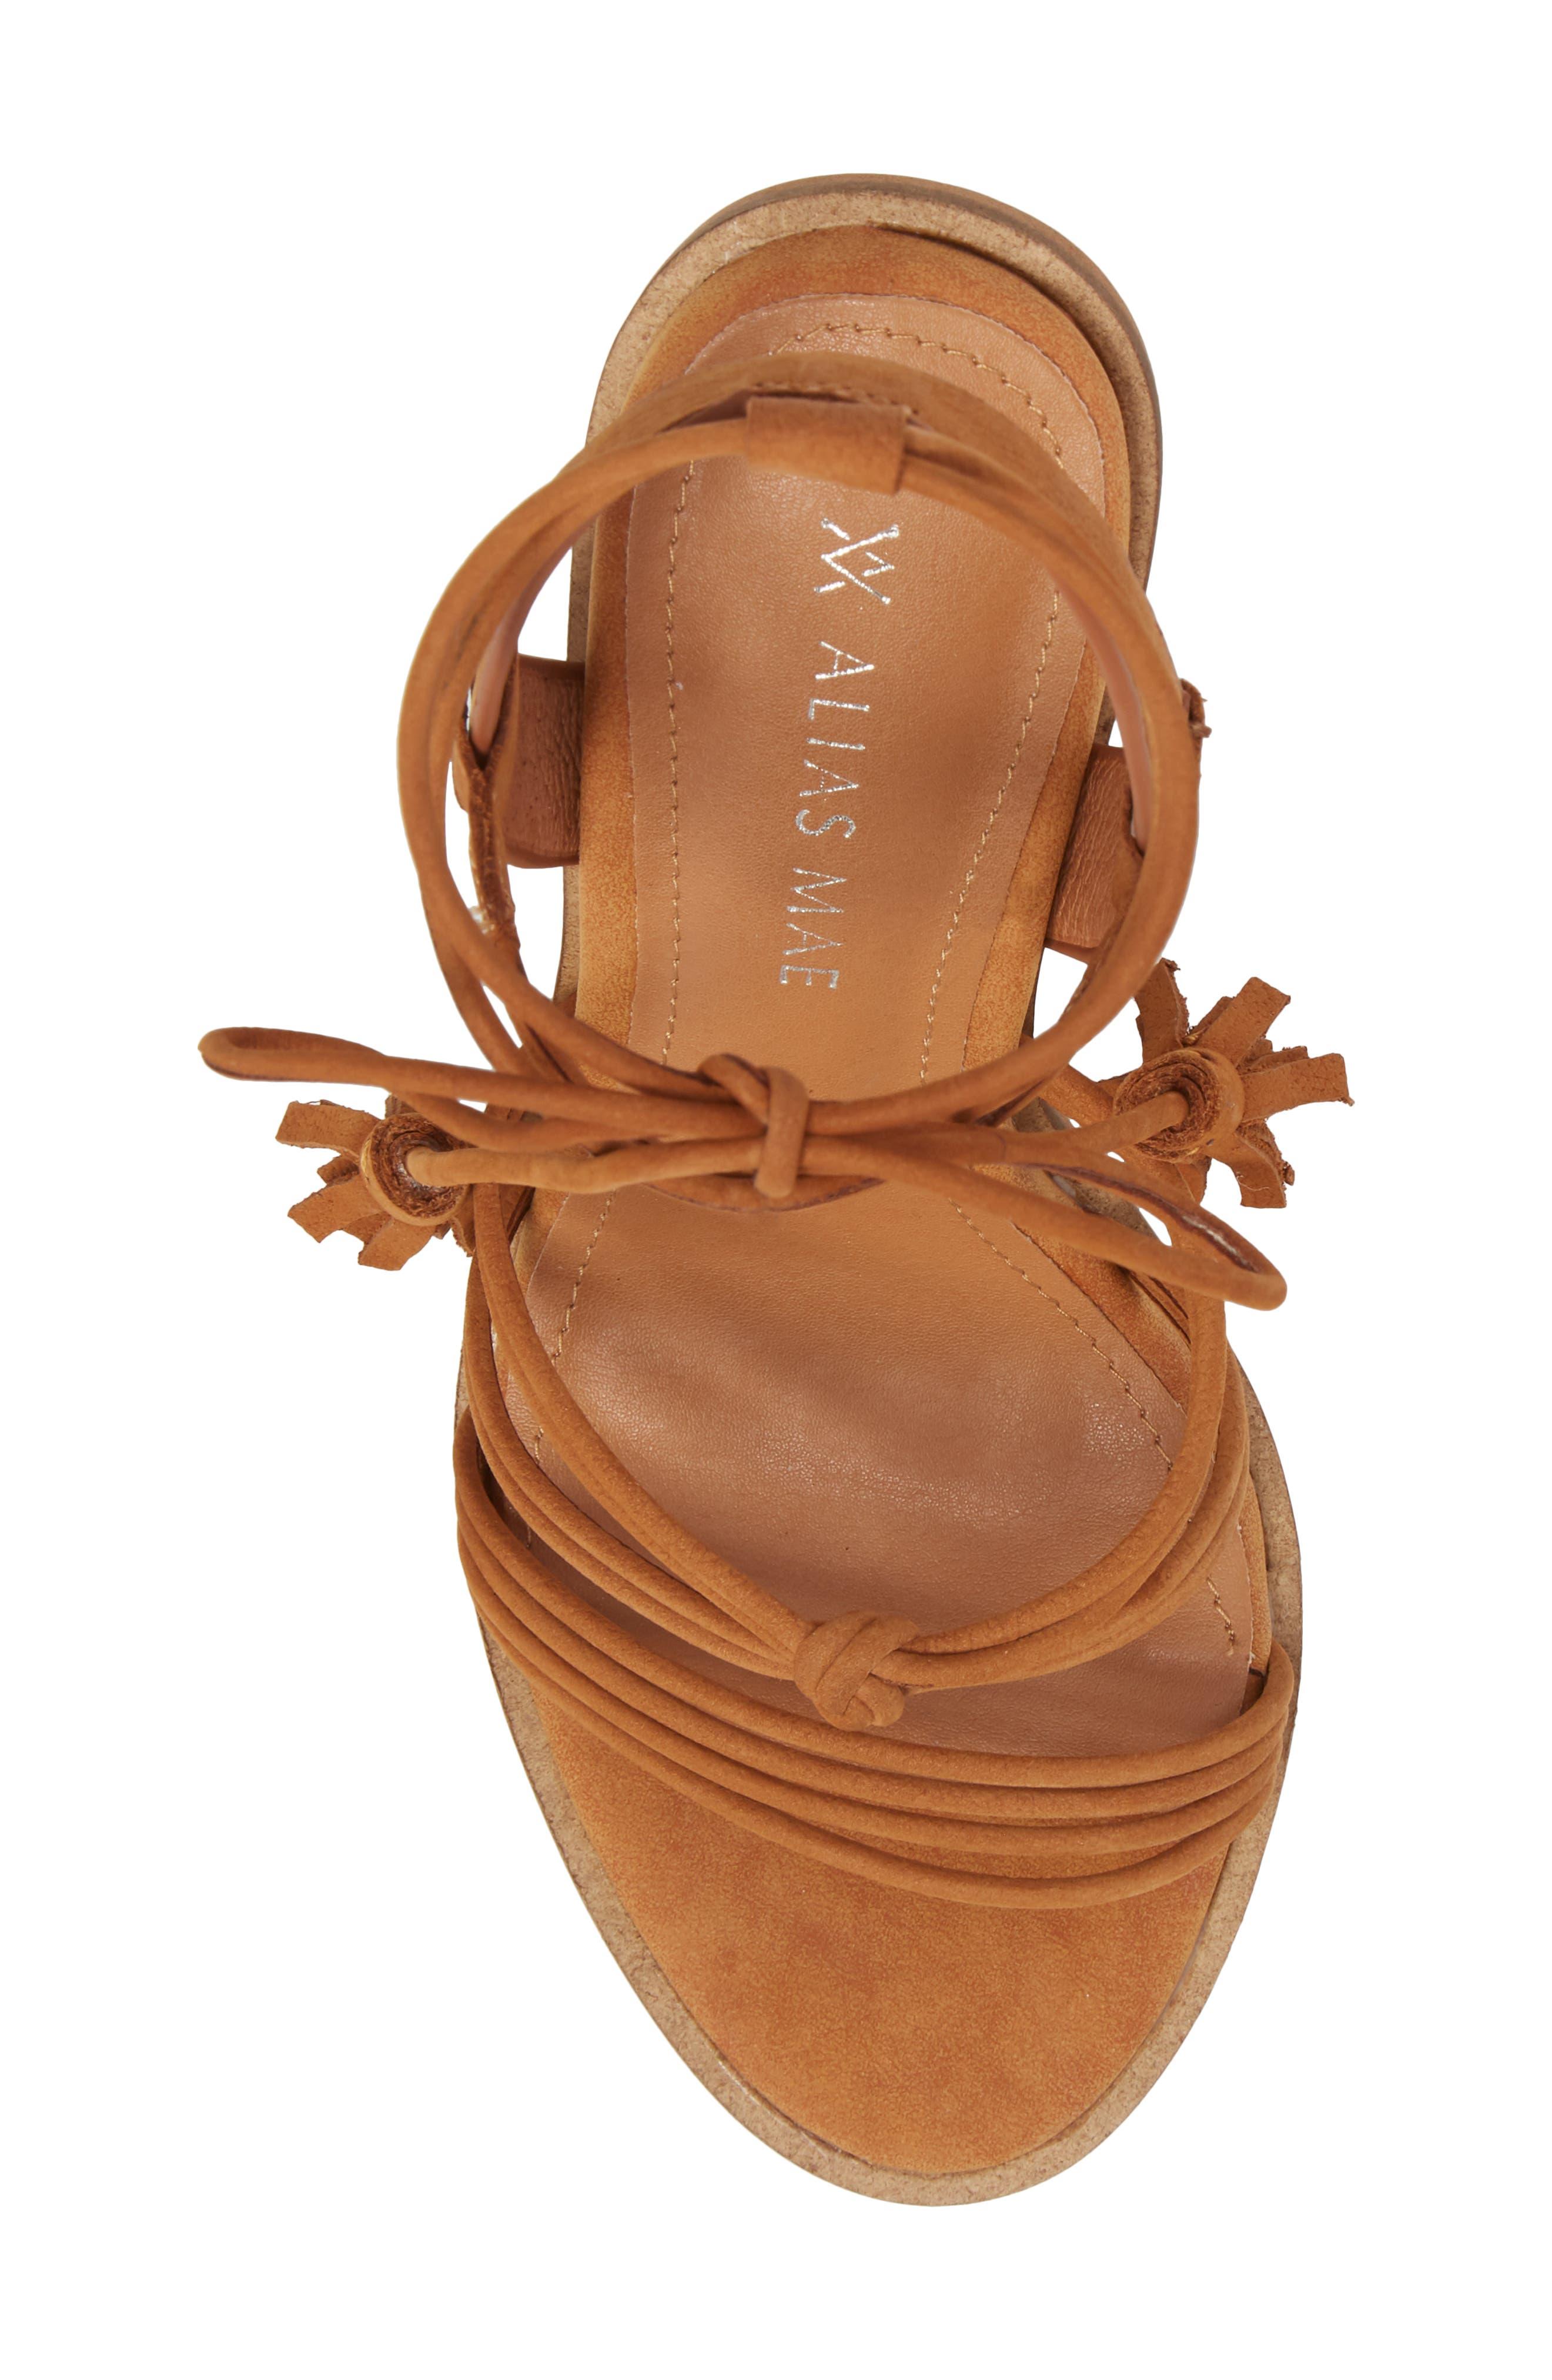 Adagio Sandal,                             Alternate thumbnail 5, color,                             Tan Leather